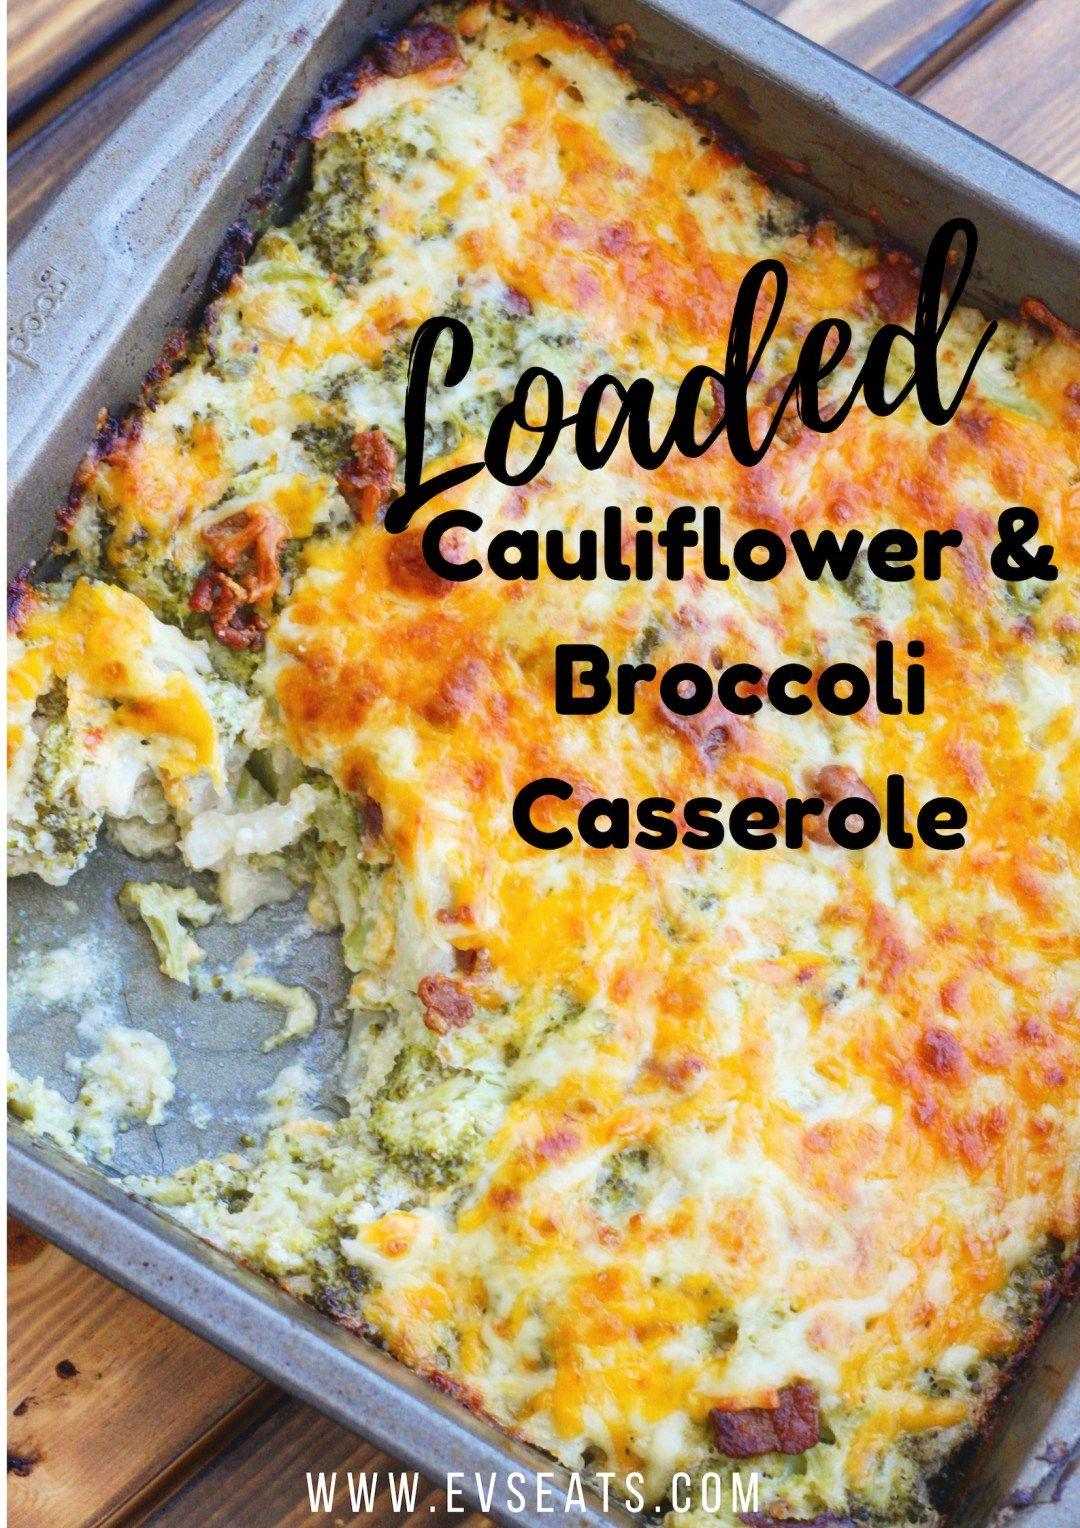 Loaded Cauliflower Broccoli Casserole - Ev's Eats